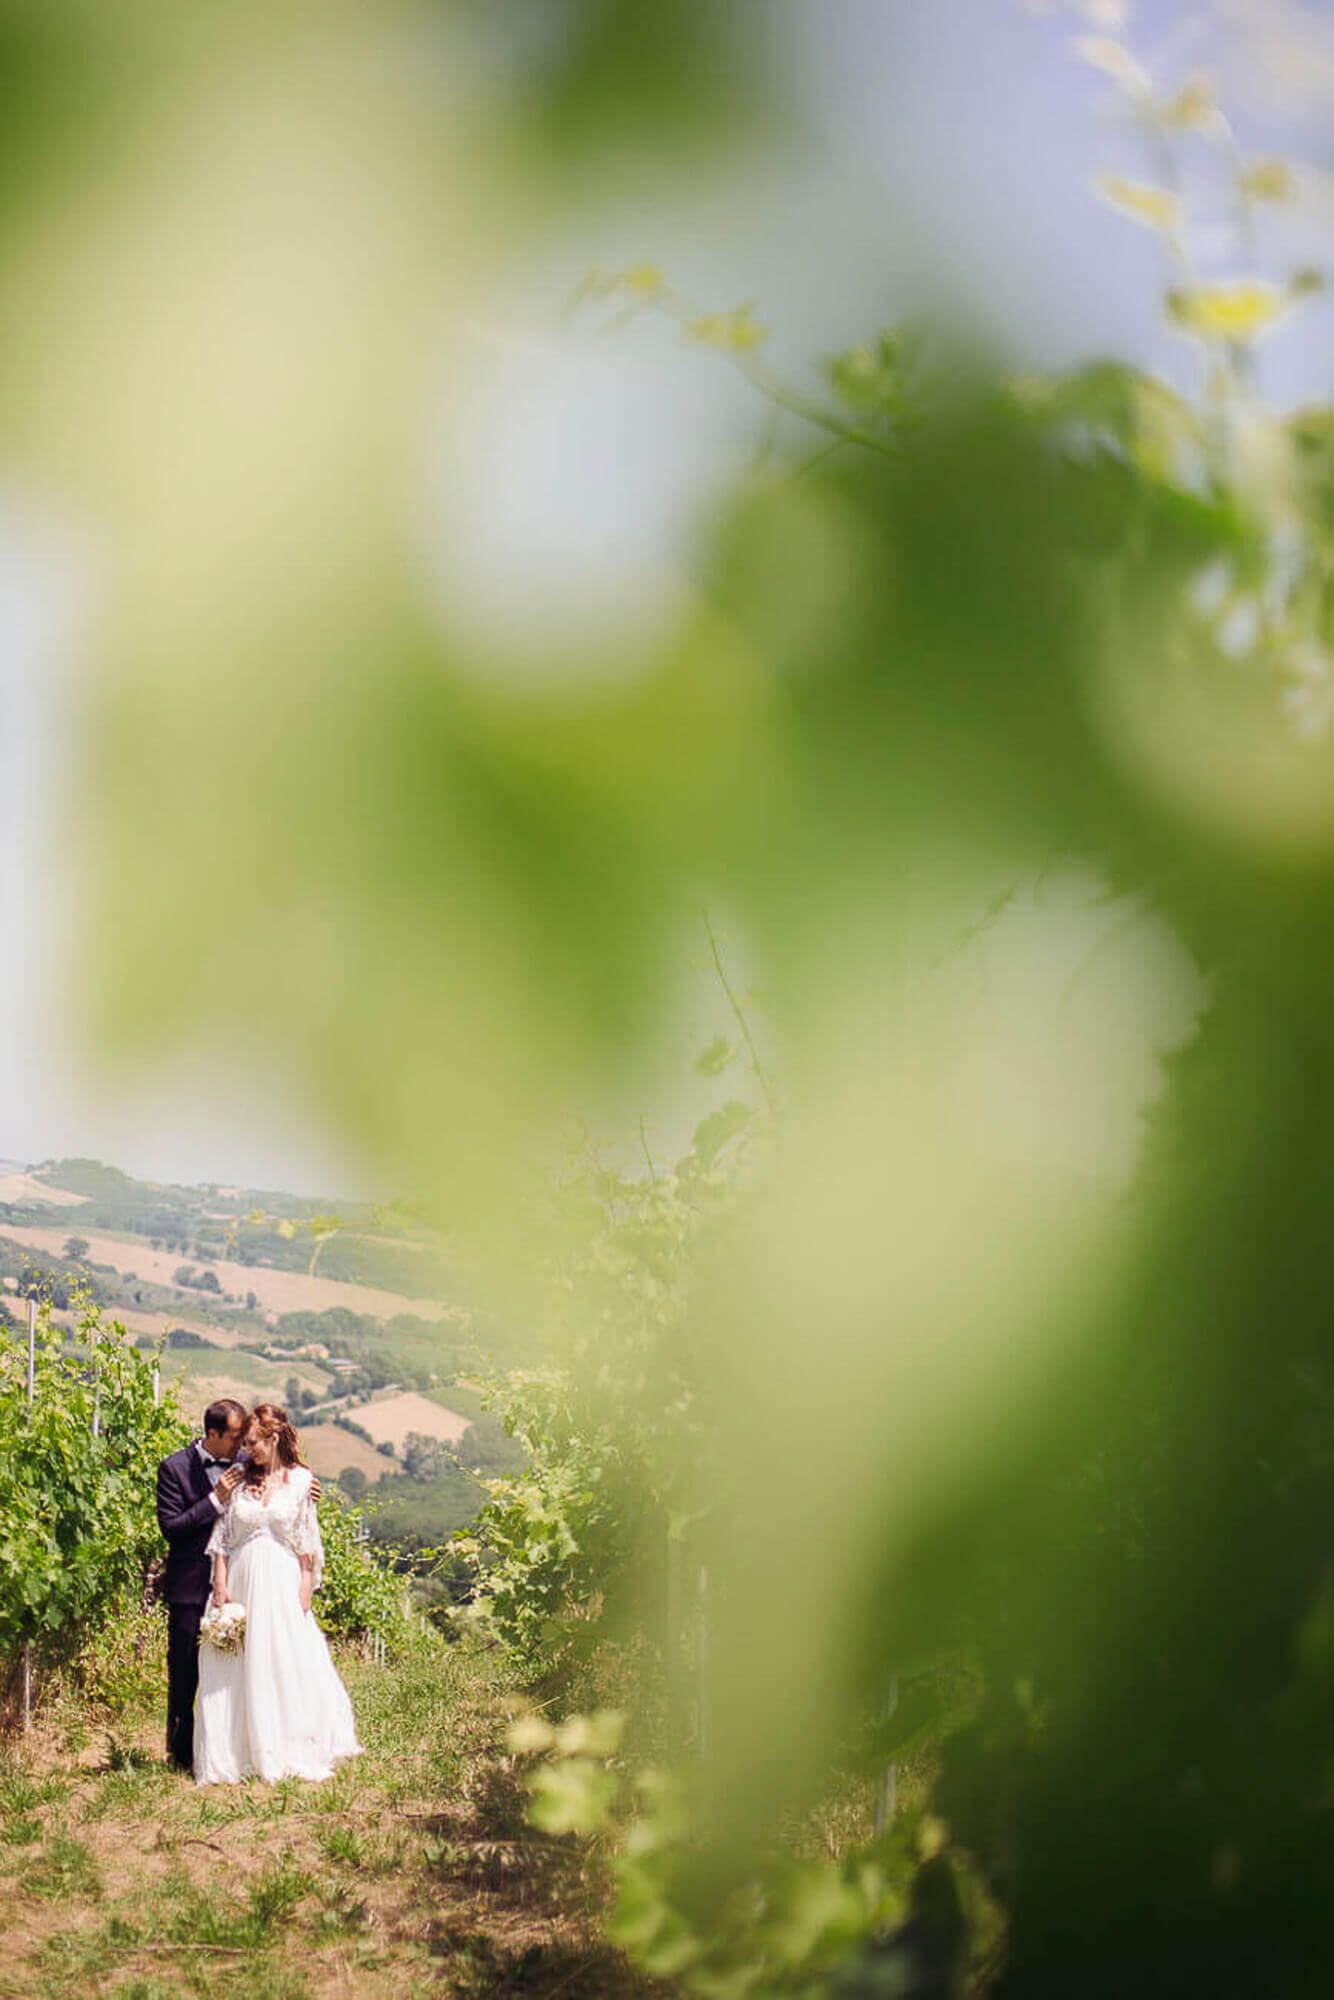 109_wedding_vino_ortezzano.jpg